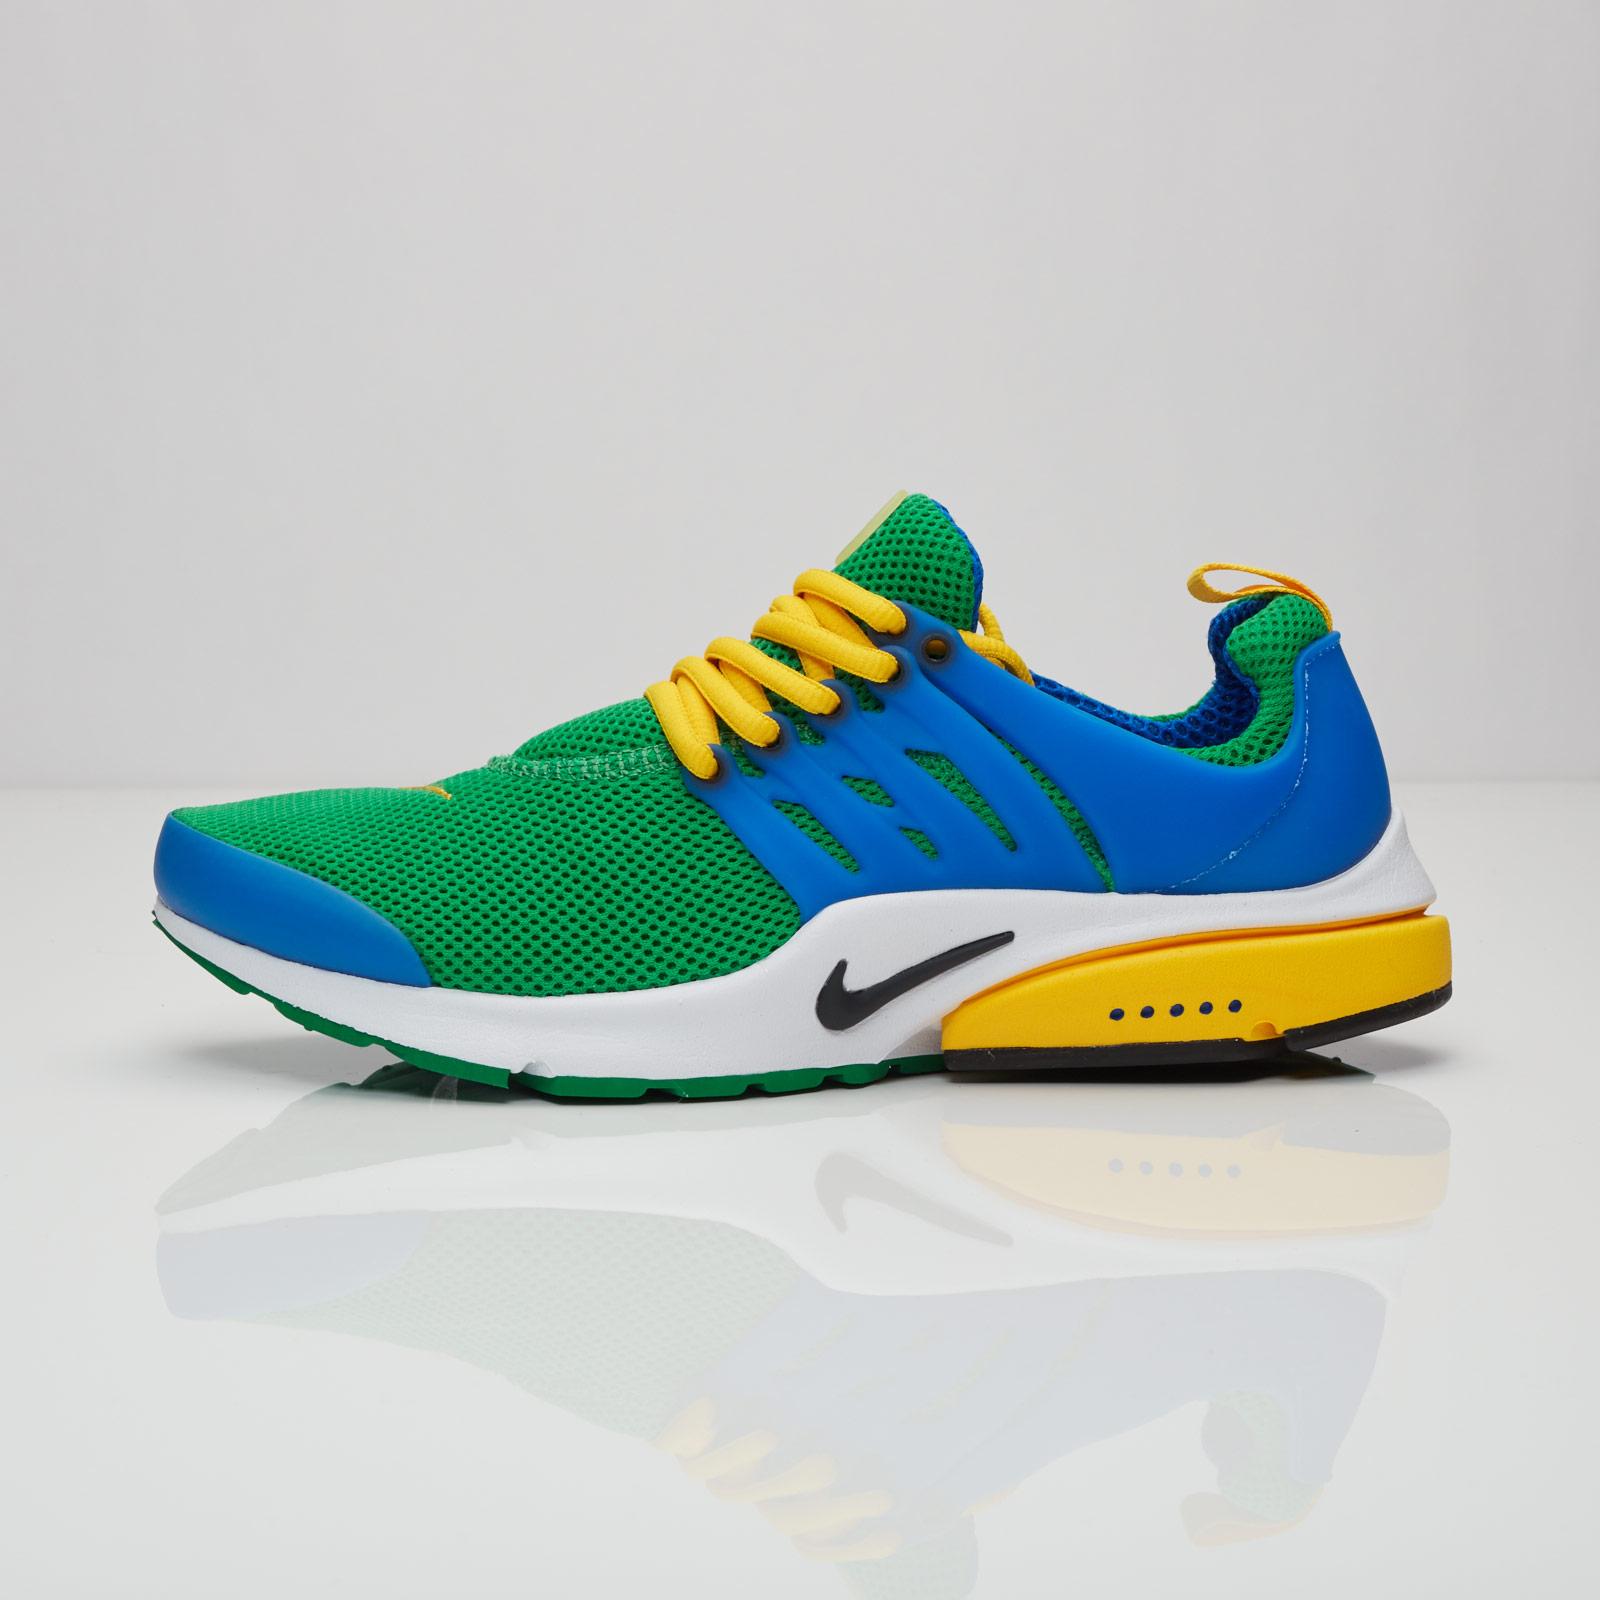 79e56a8861a1 Nike Air Presto Essential - 848187-300 - Sneakersnstuff